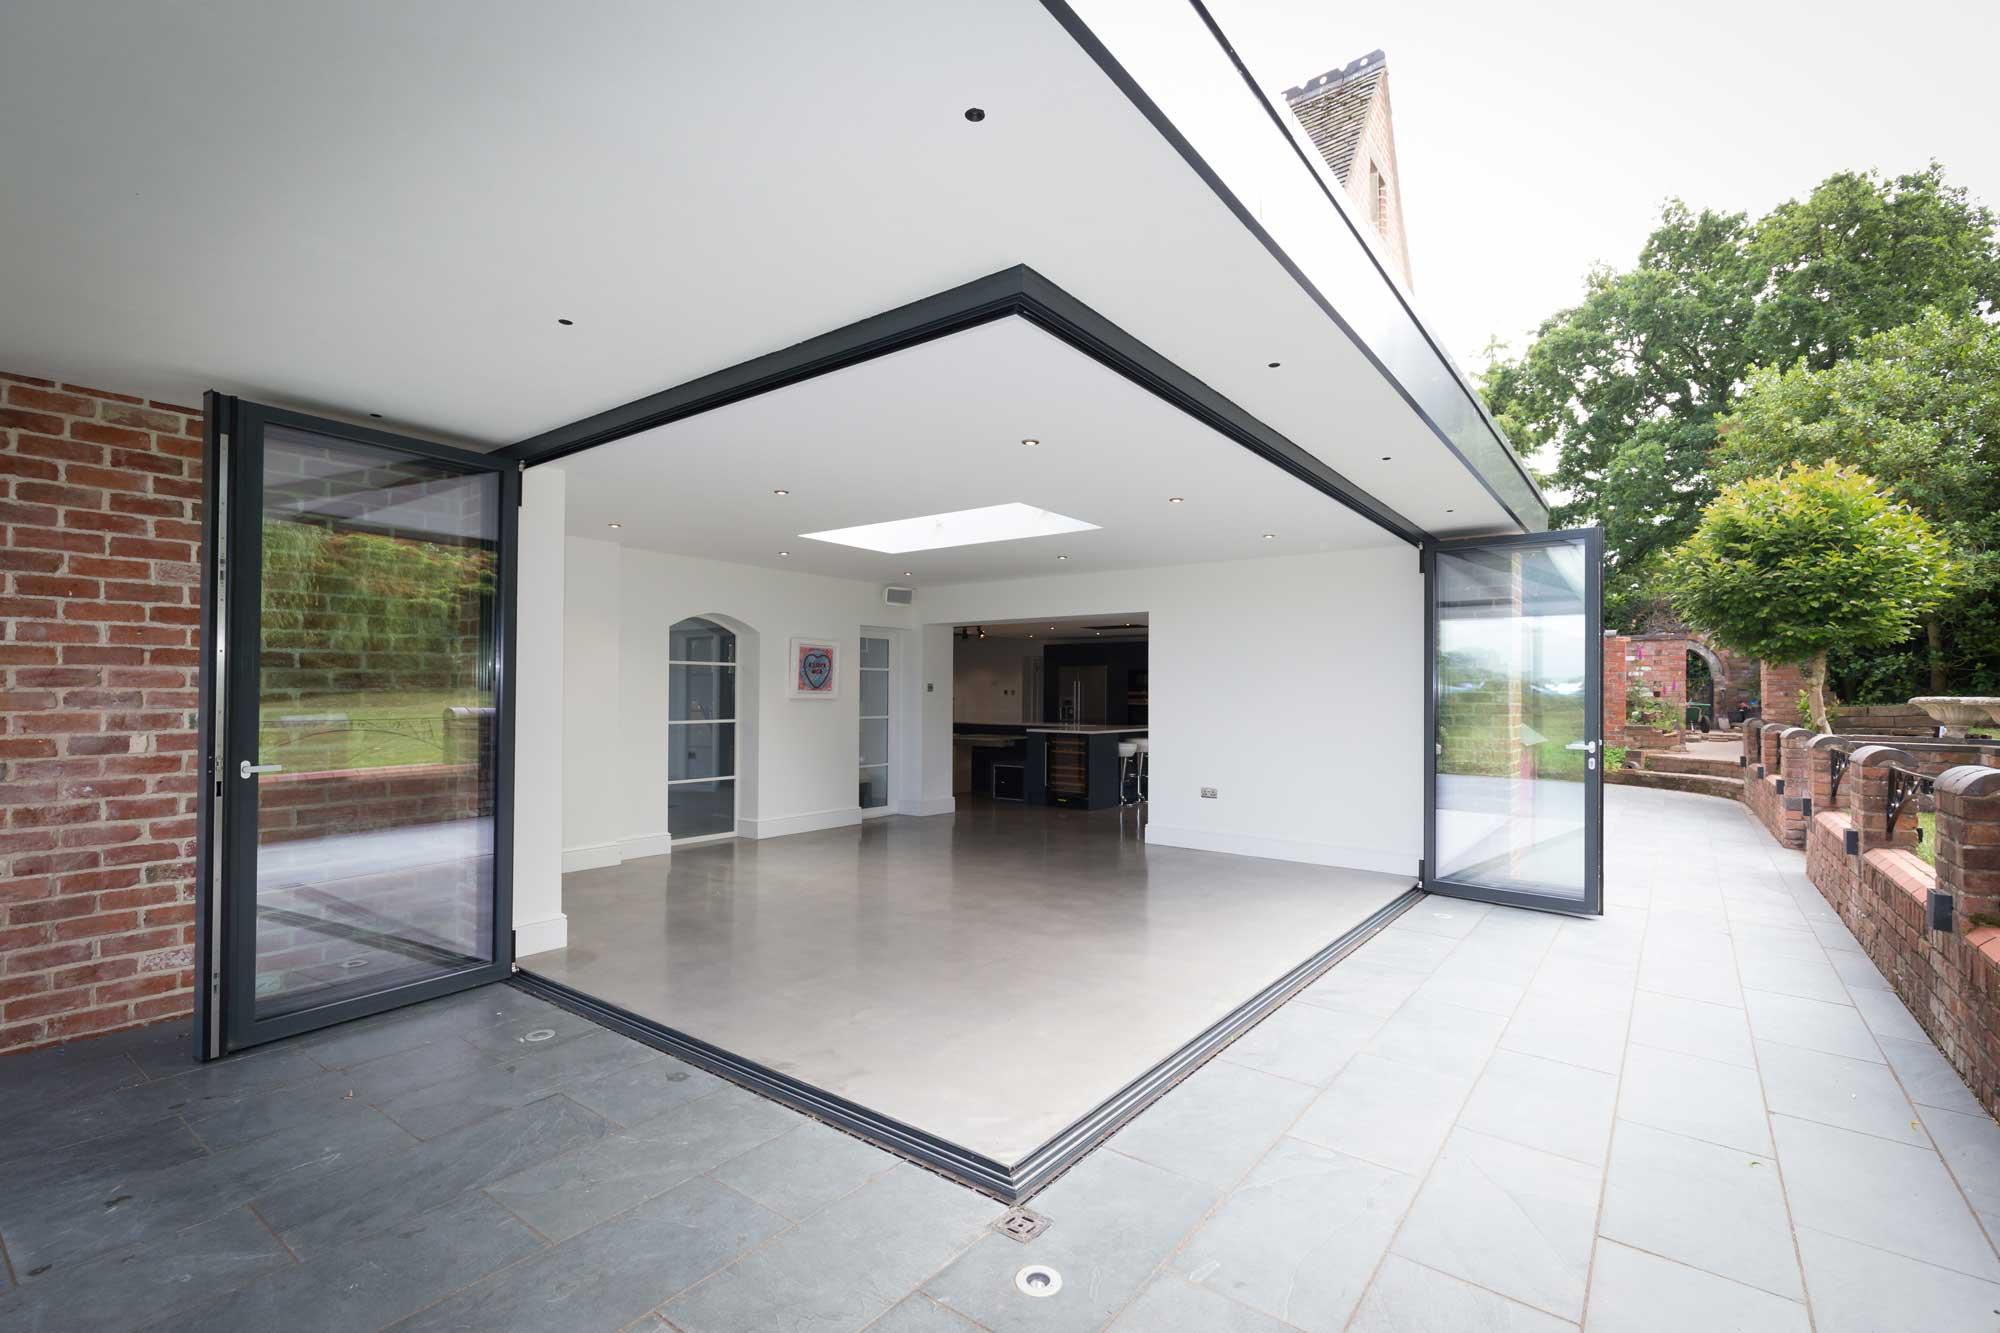 bi-folding doors with cornerless opening and seamless level threshold